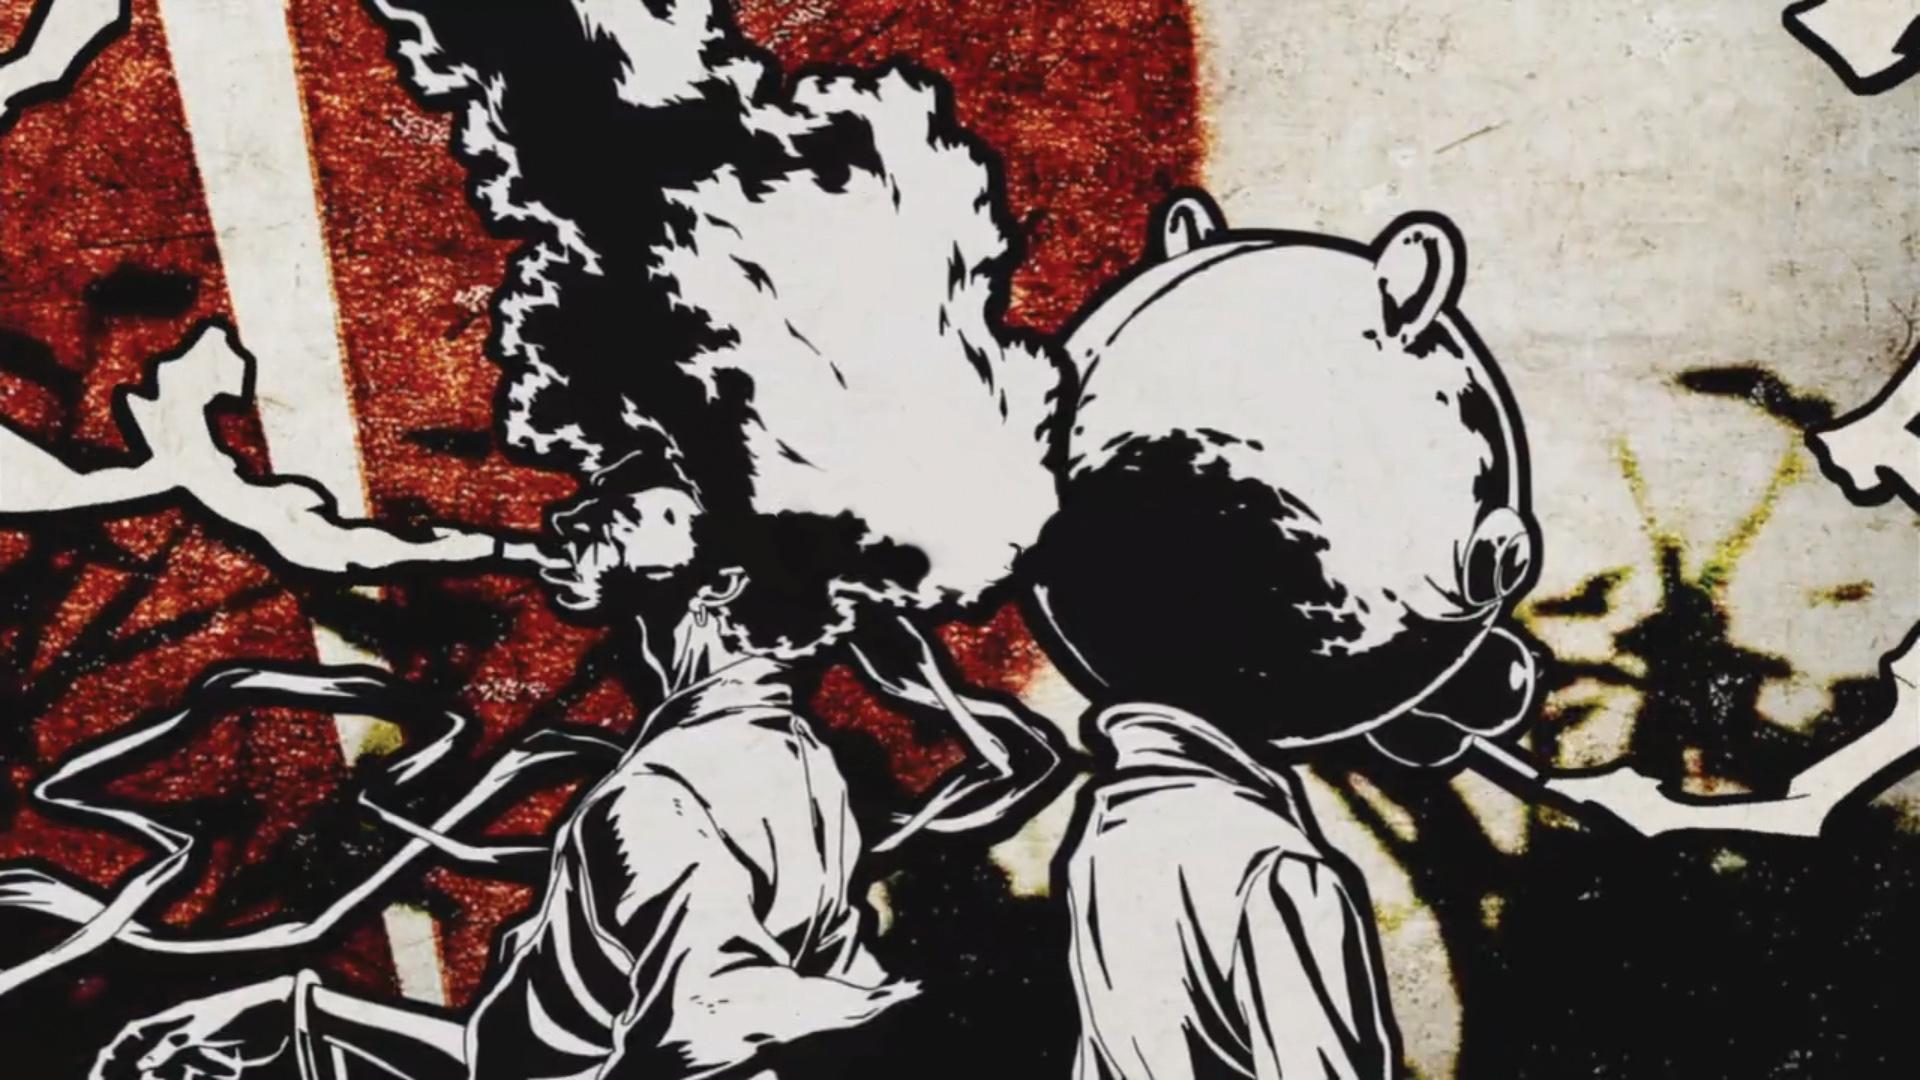 afro samurai hd wallpaper. - media file | pixelstalk